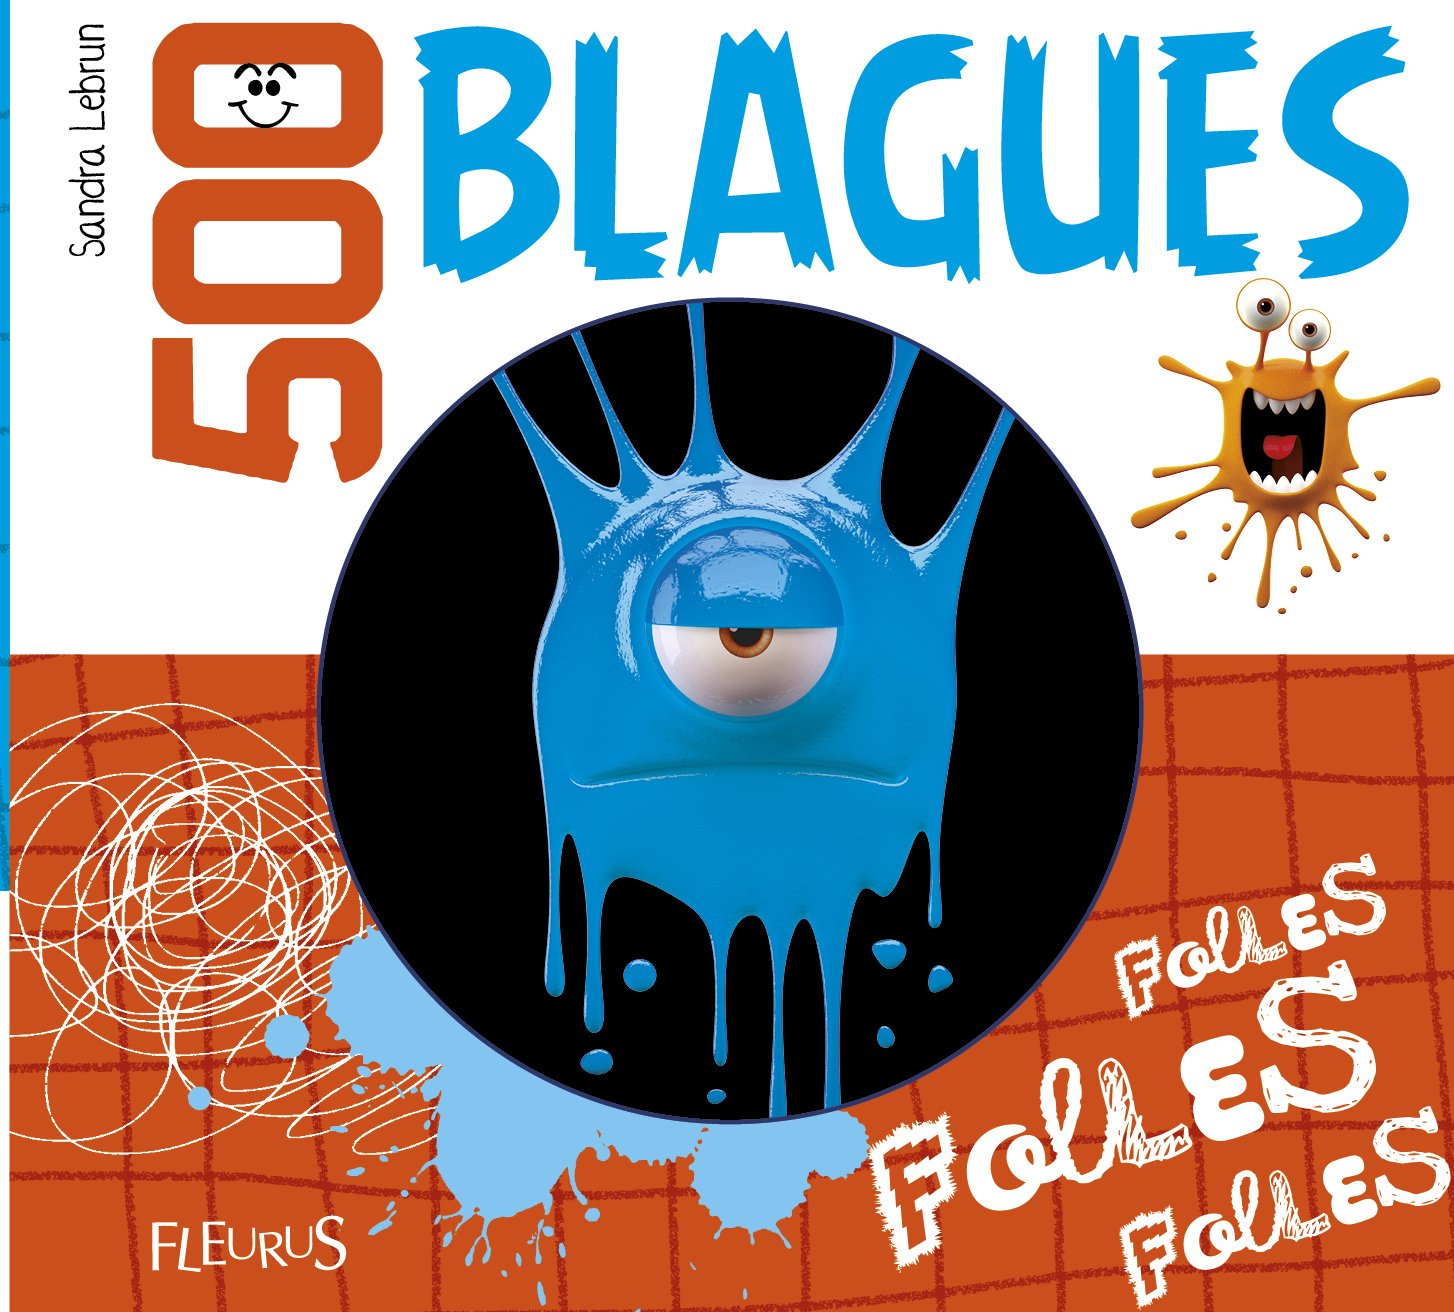 500 blagues folles, folles, folles Poche – 9 octobre 2014 Sandra Lebrun Fleurus 2215147938 Humour - magie